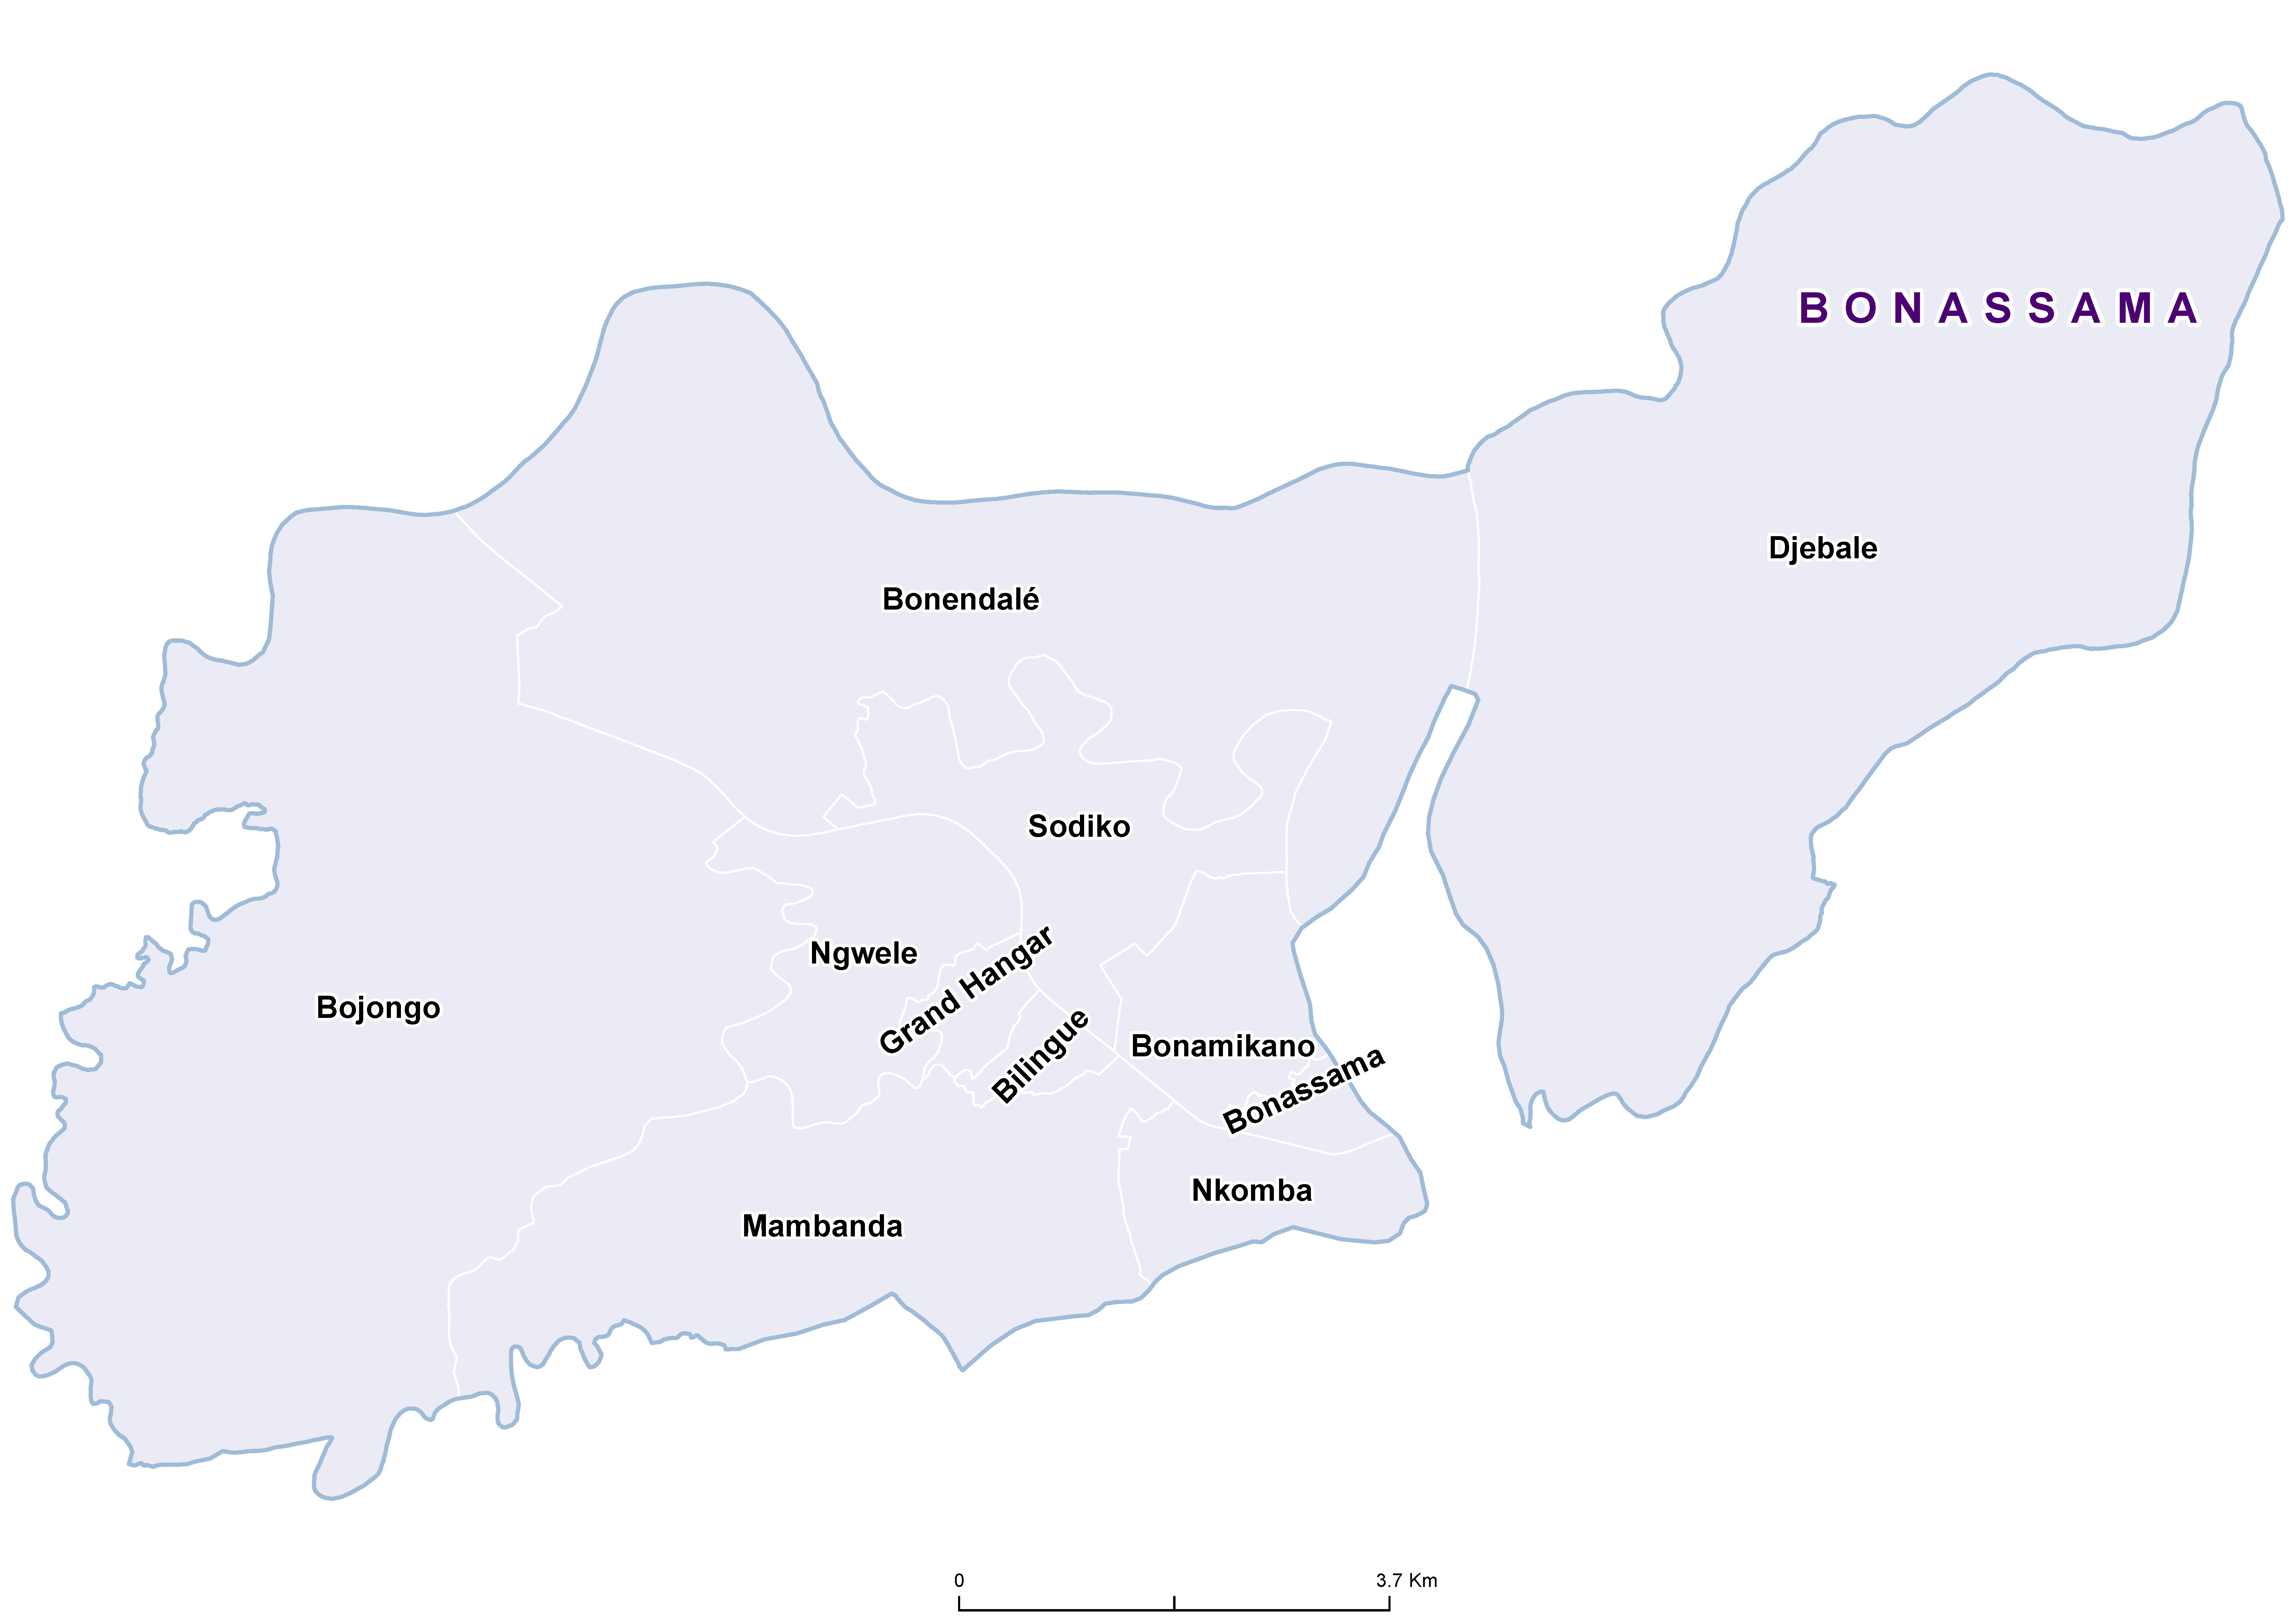 Bonassama STH 20180001